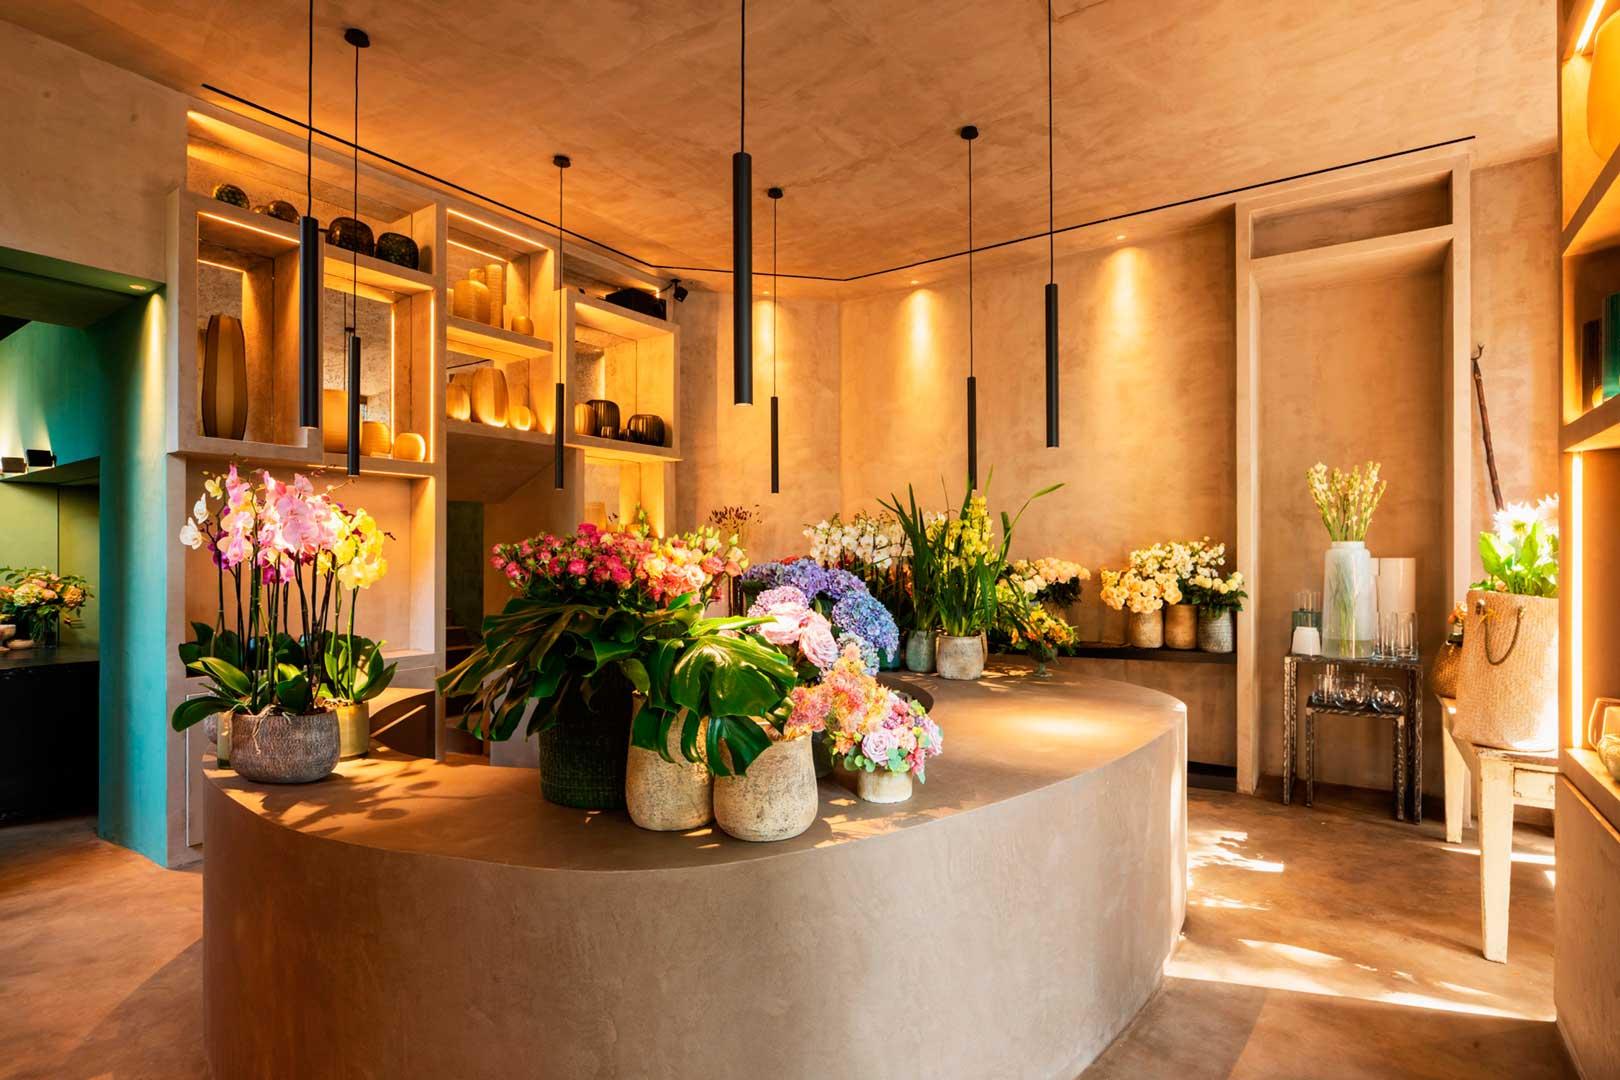 The 10 best flower shops in milan flawless milano for Negozi di arredamento milano